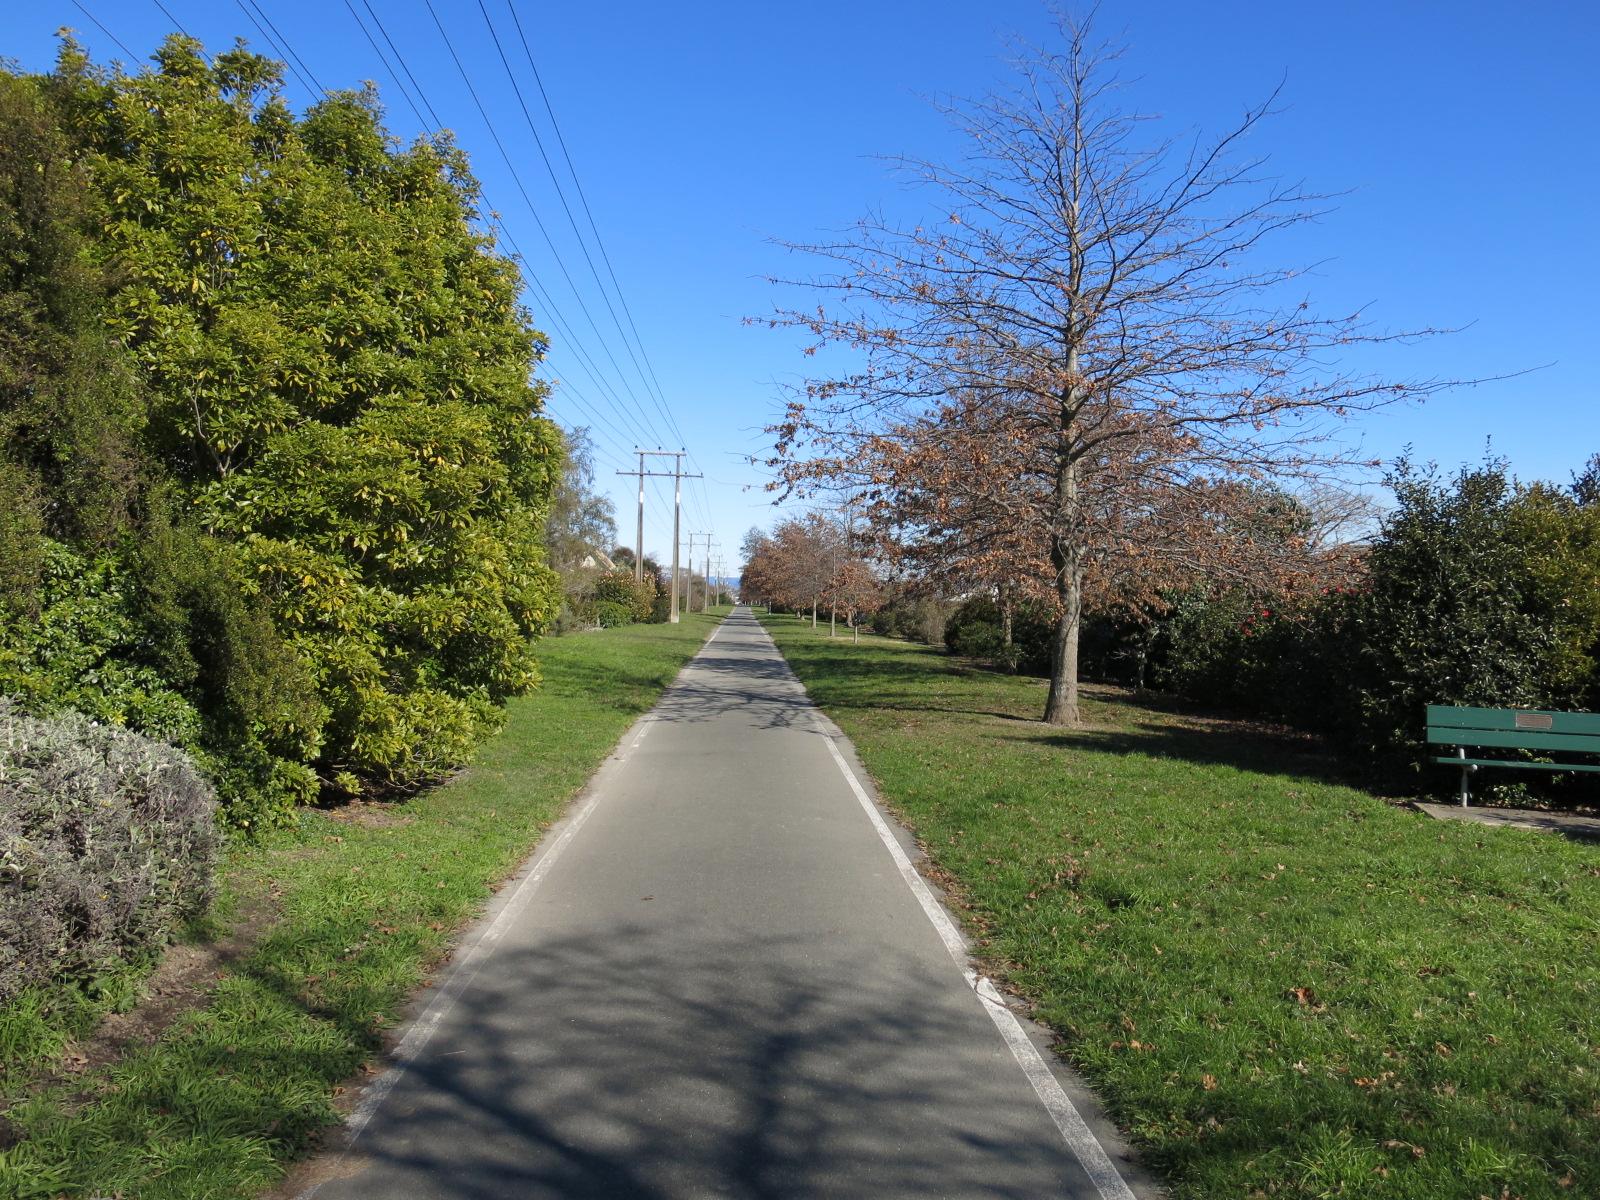 Rail Way Reserve 家の裏道を抜けるとこの遊歩道